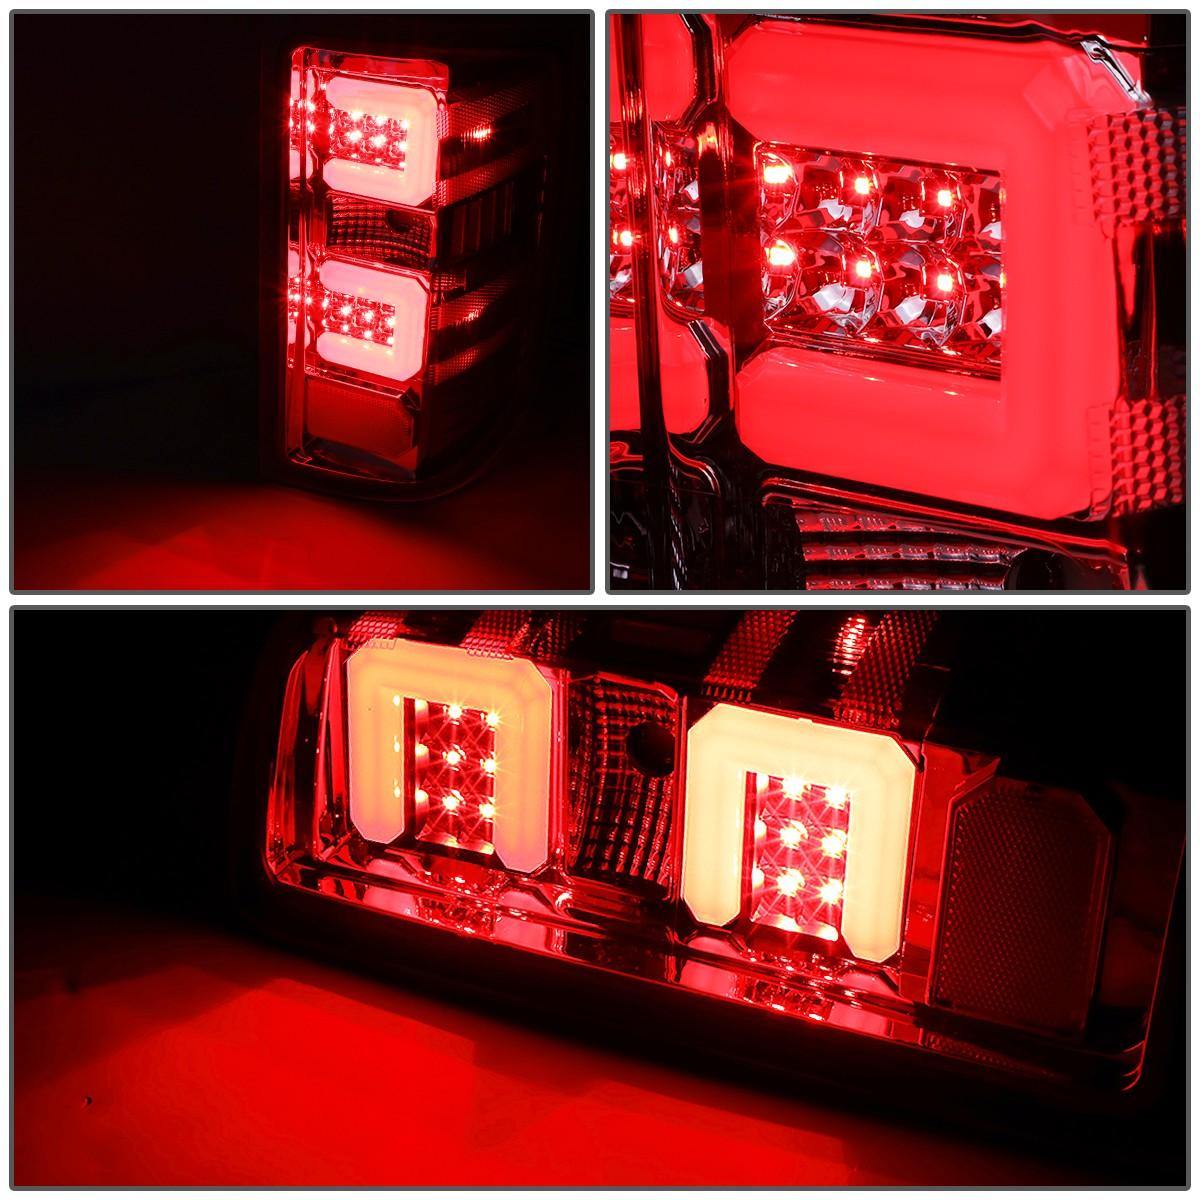 For 15 17 Chevy Silverado GMC Sierra 1500 2500 3500 HD 3D LED Light